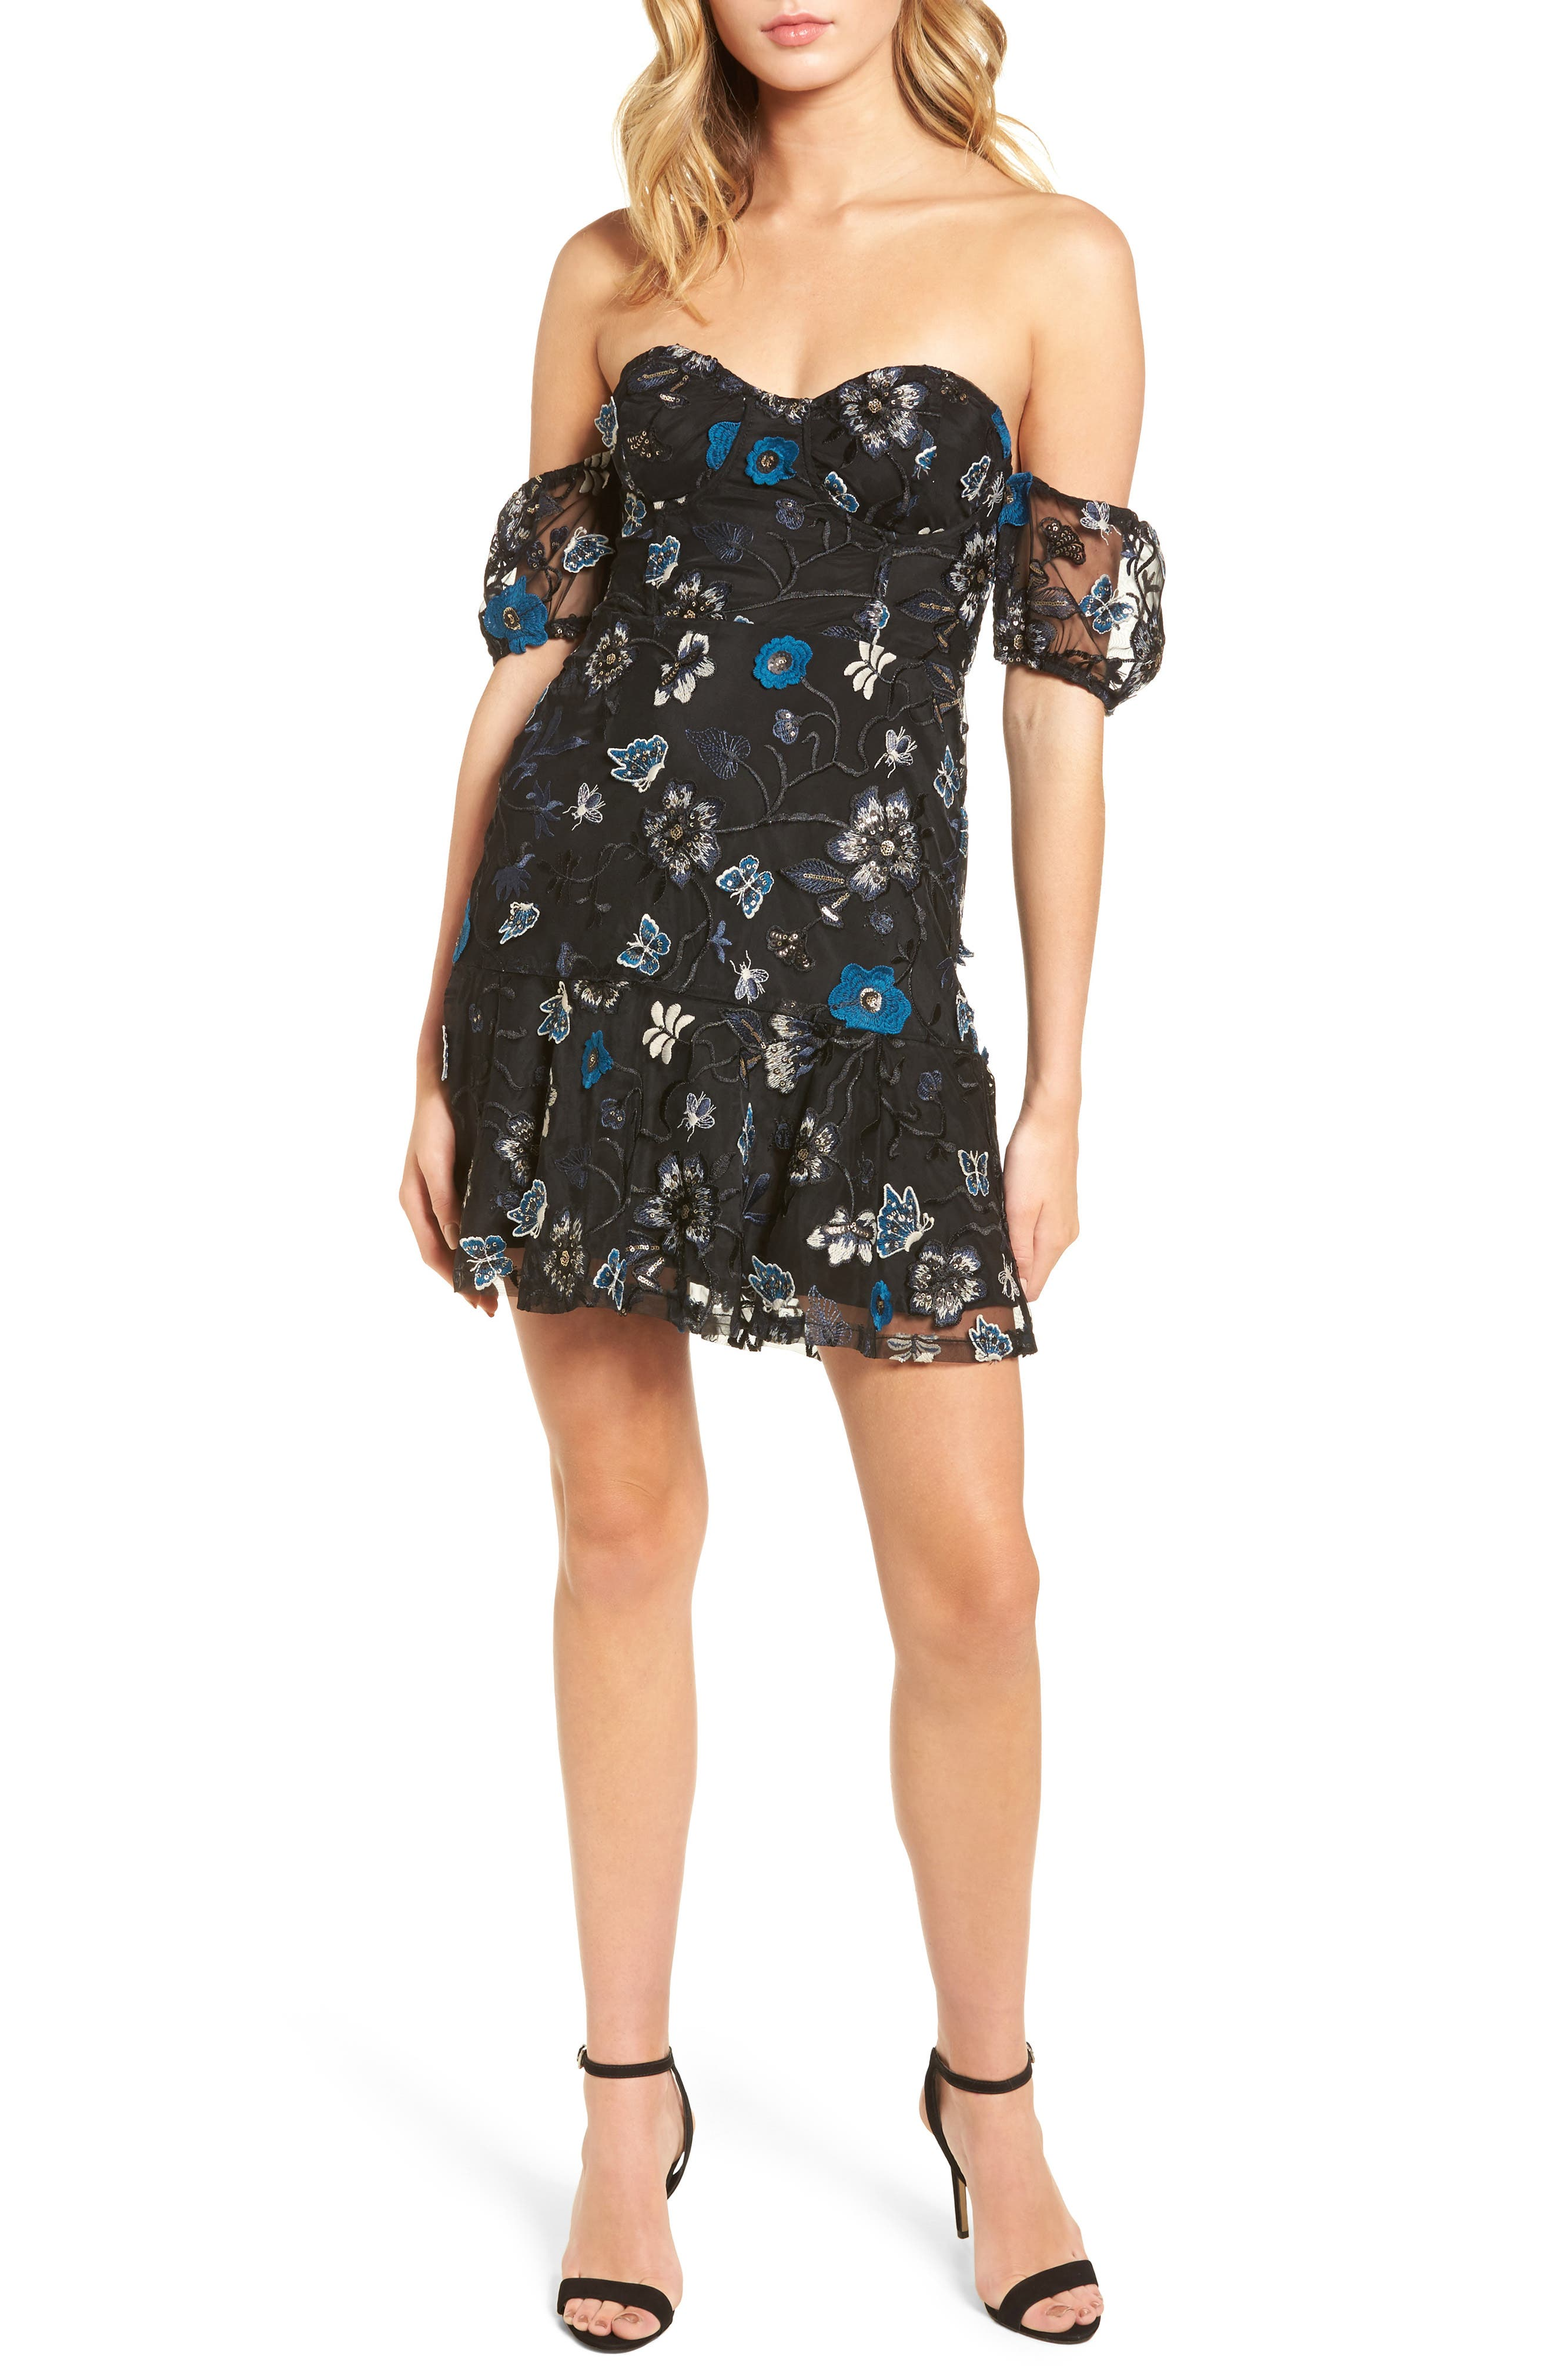 Bontanic Off the Shoulder Dress,                         Main,                         color, 002